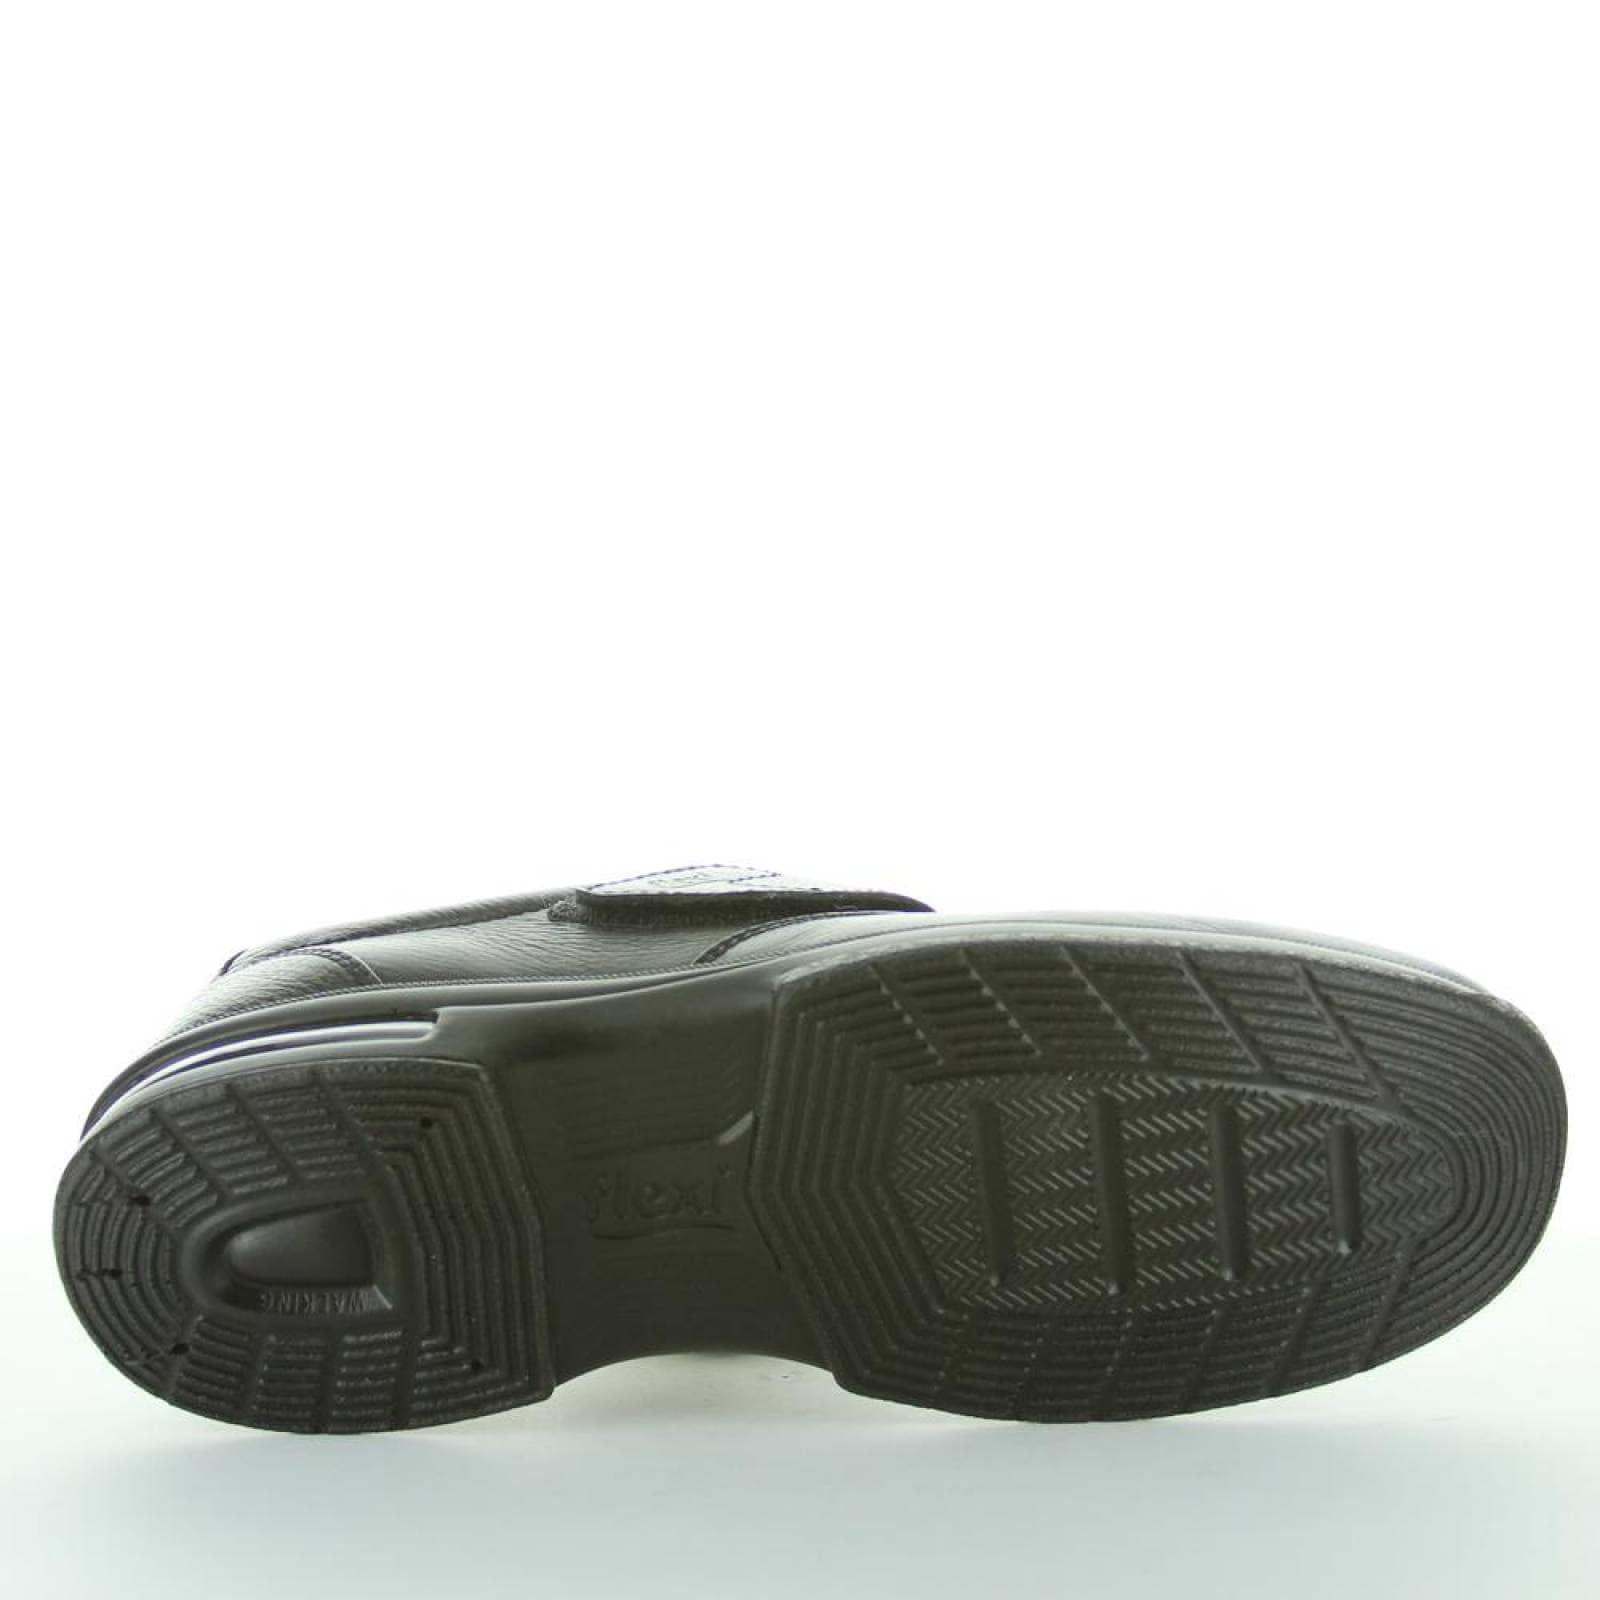 Zapato Casual Hombre Flexi Negro 02503134 Piel